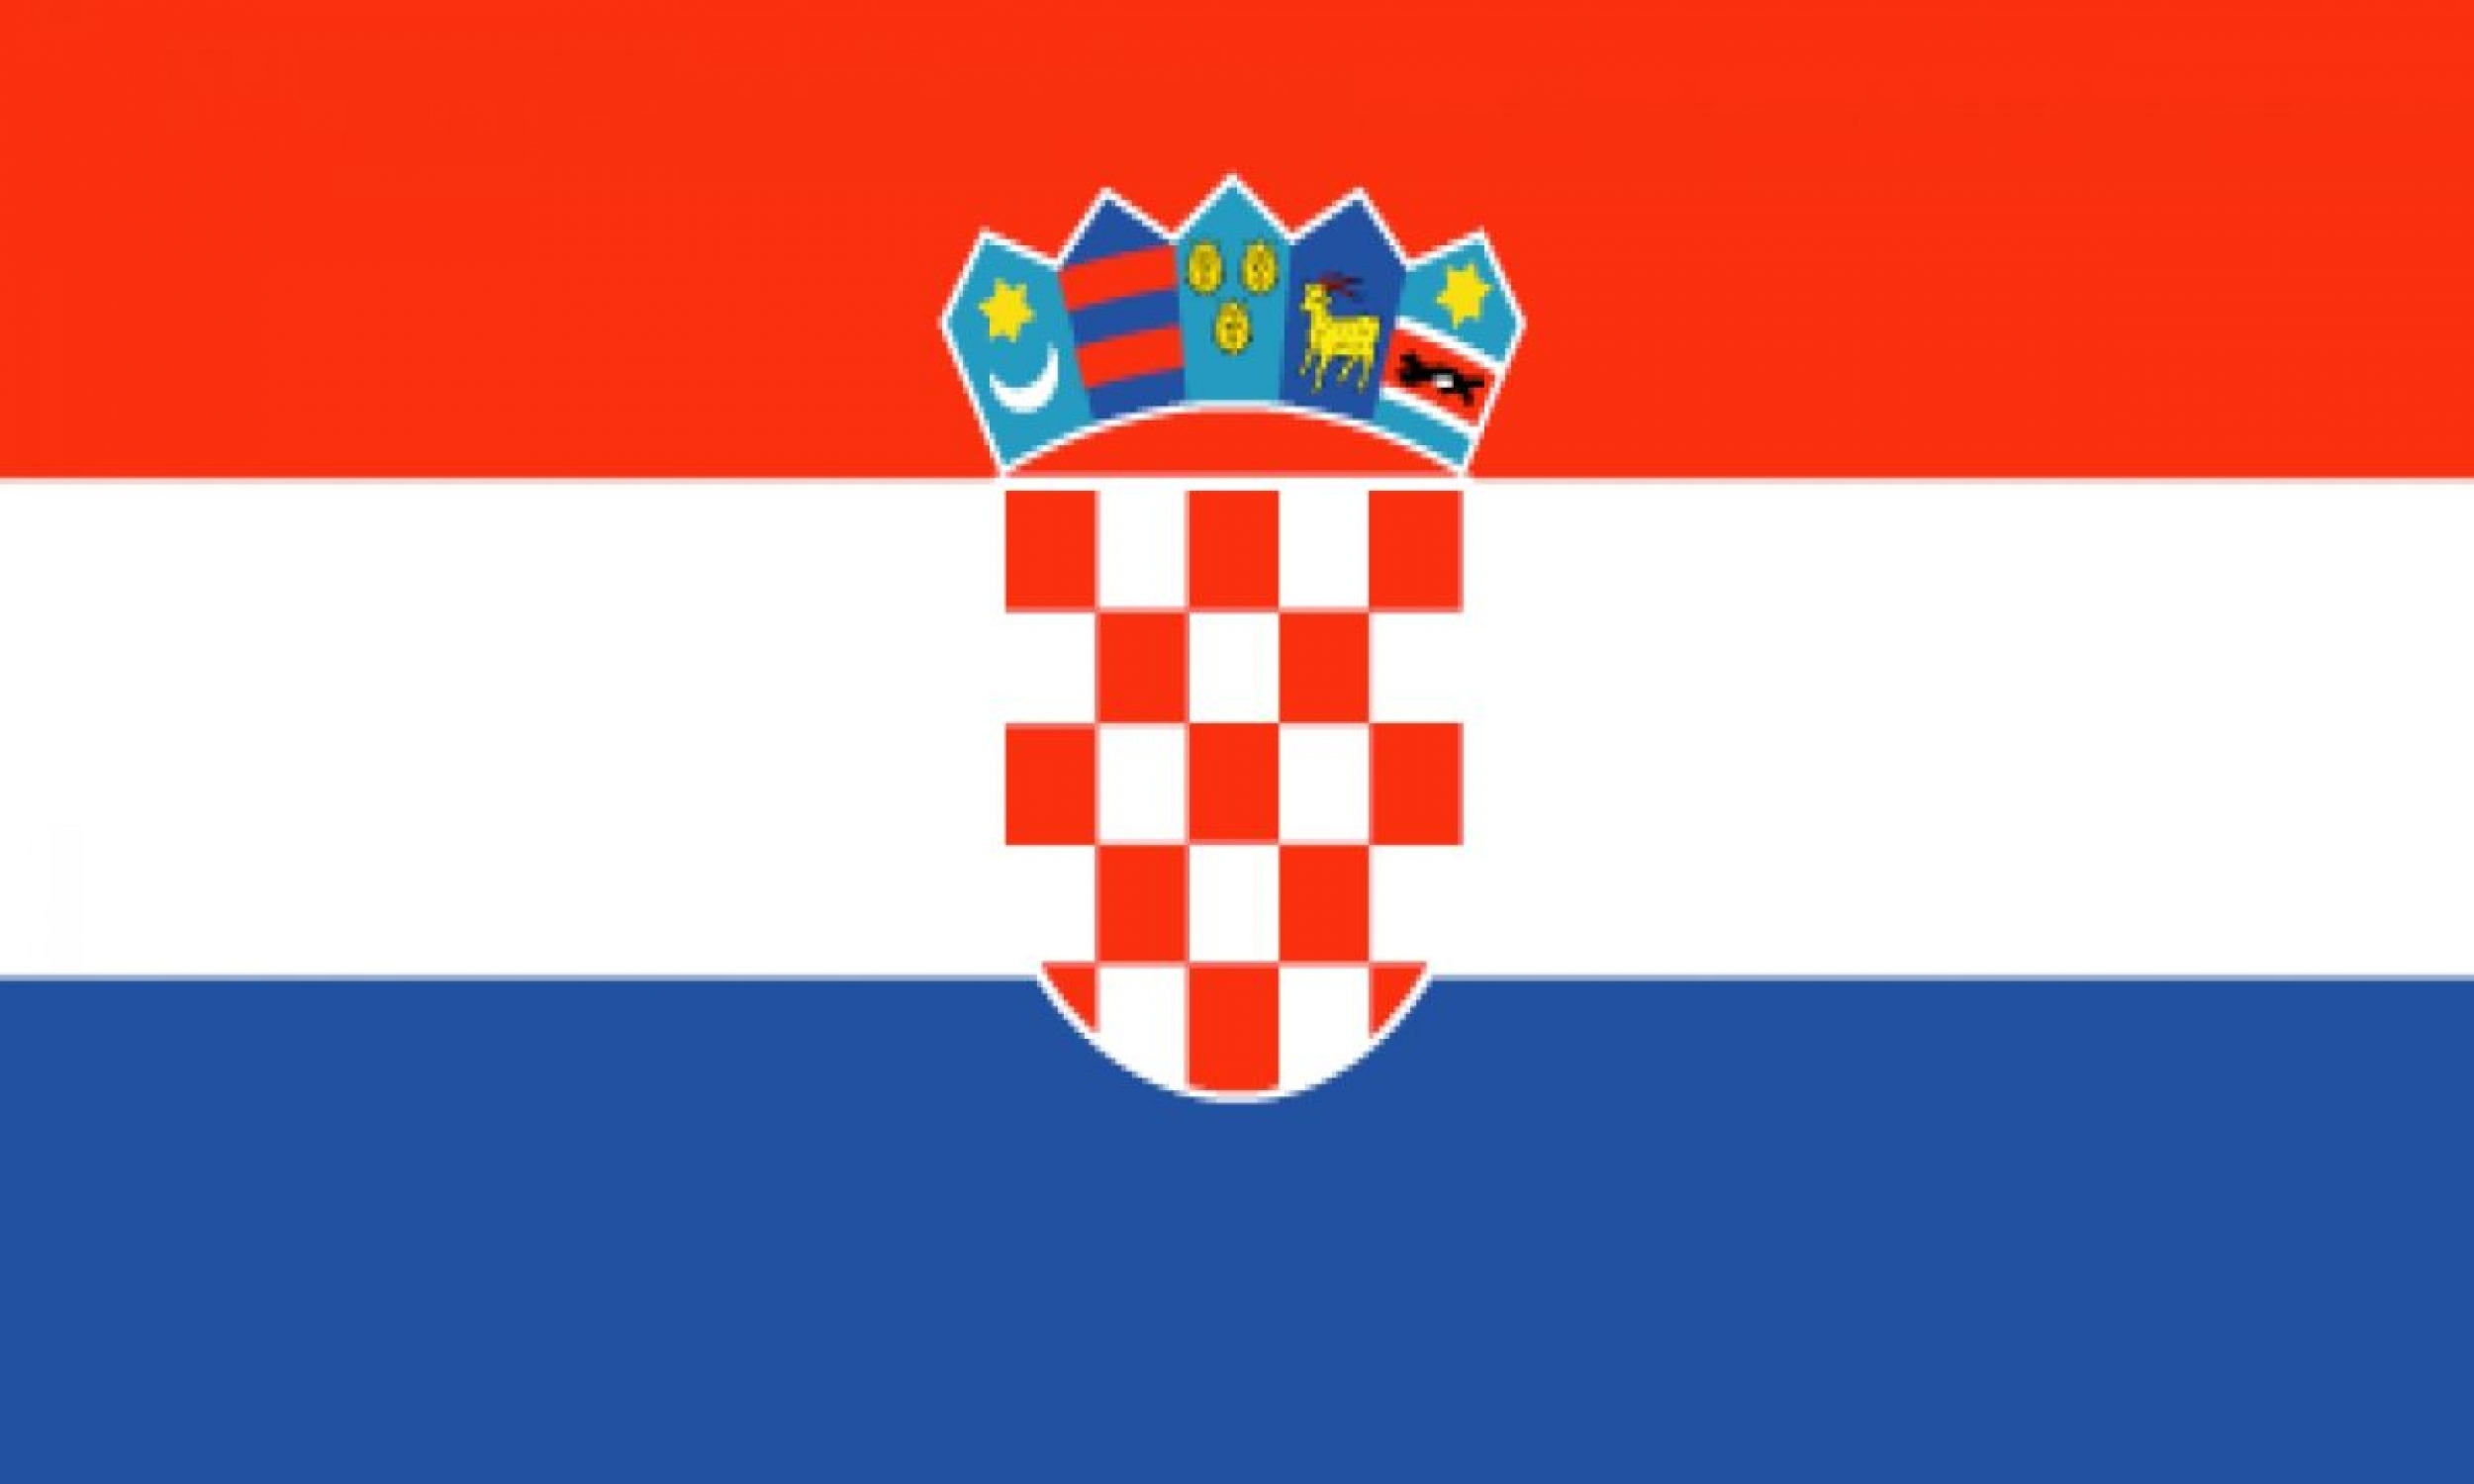 Flagi narodowe Słowian 2